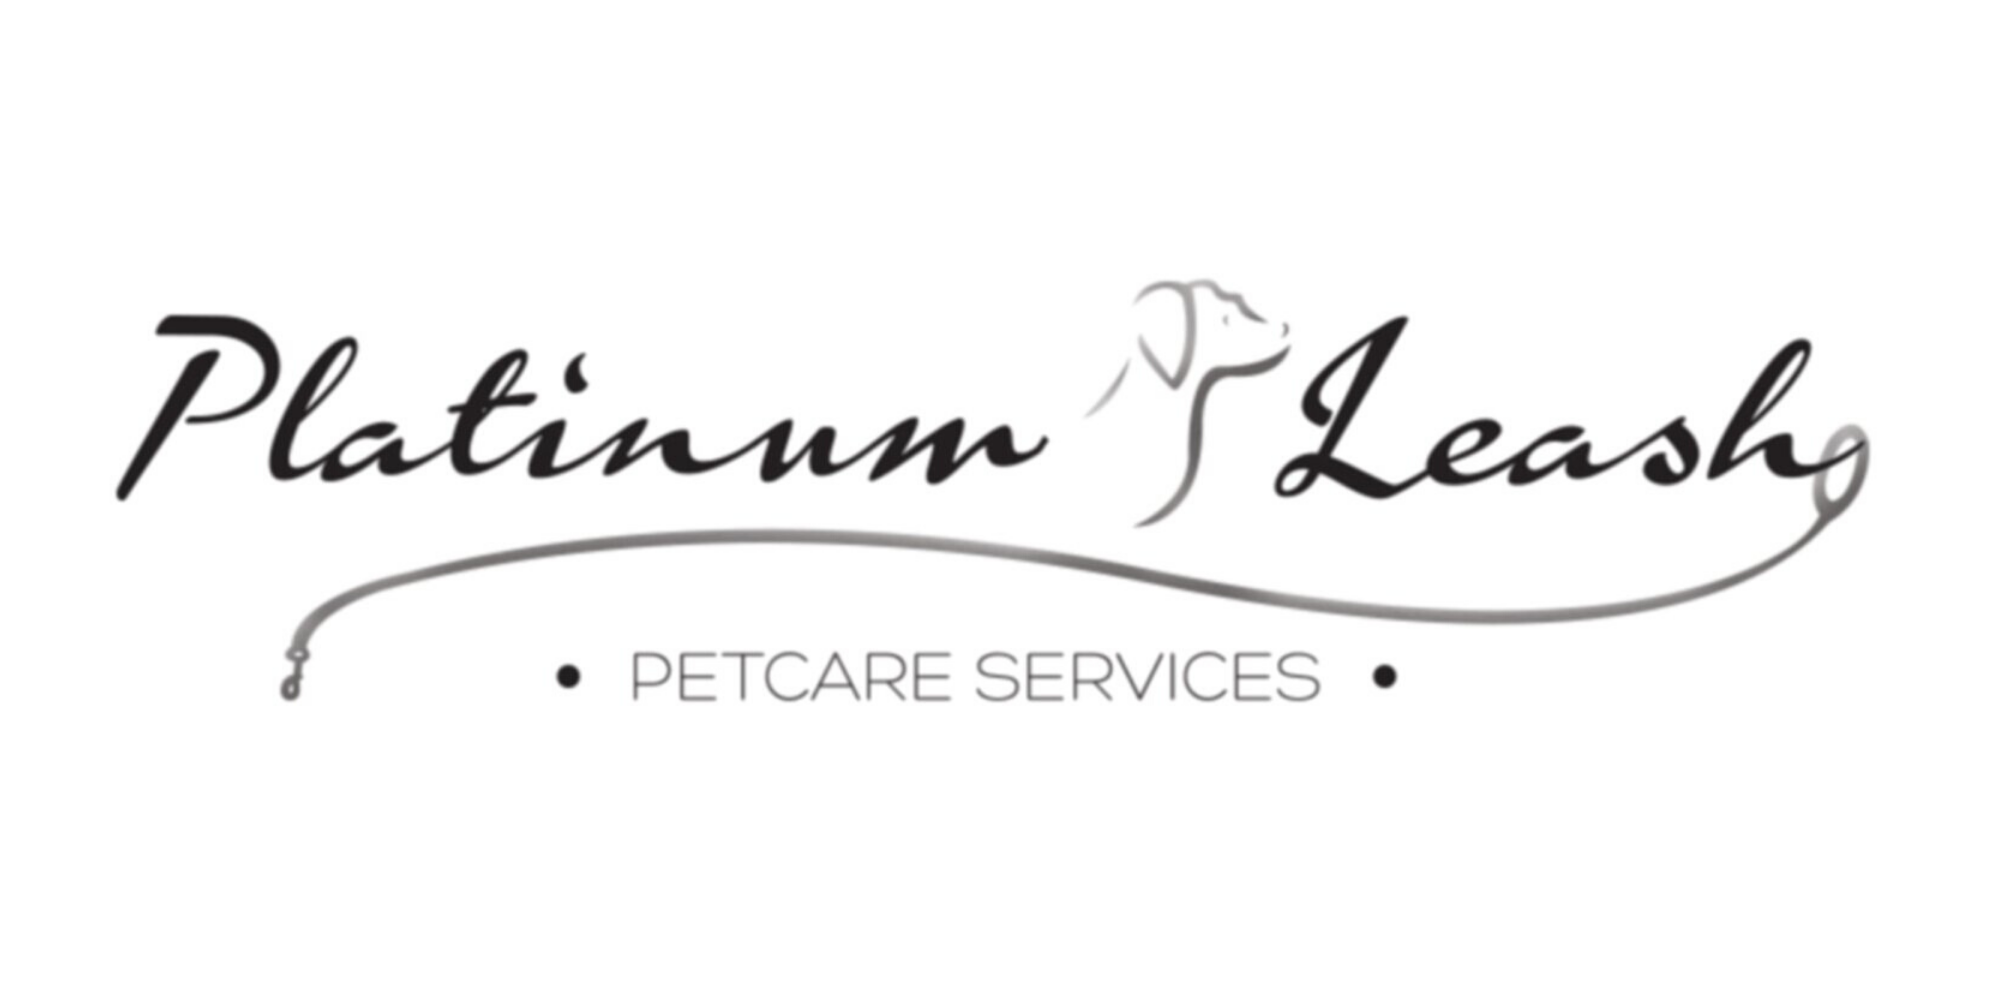 Platinum-leash-logo-summary.png